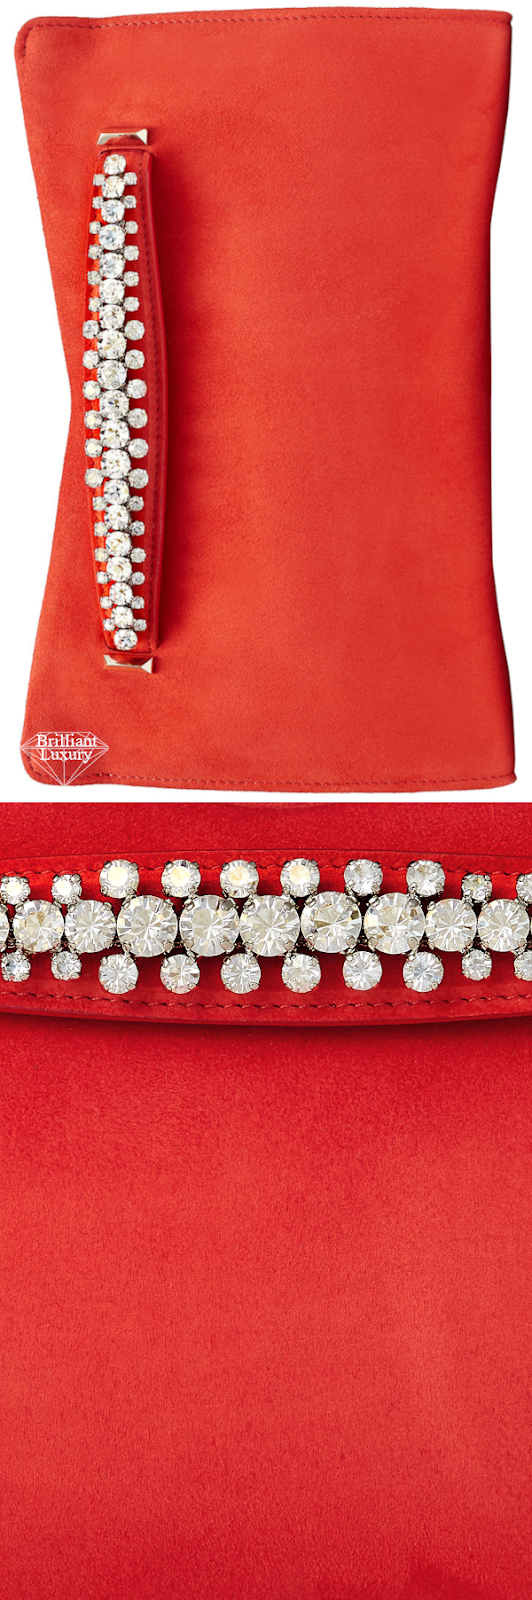 Jimmy Choo Venus Mandarin-Red Suede Clutch Bag with Crystals #brilliantluxury